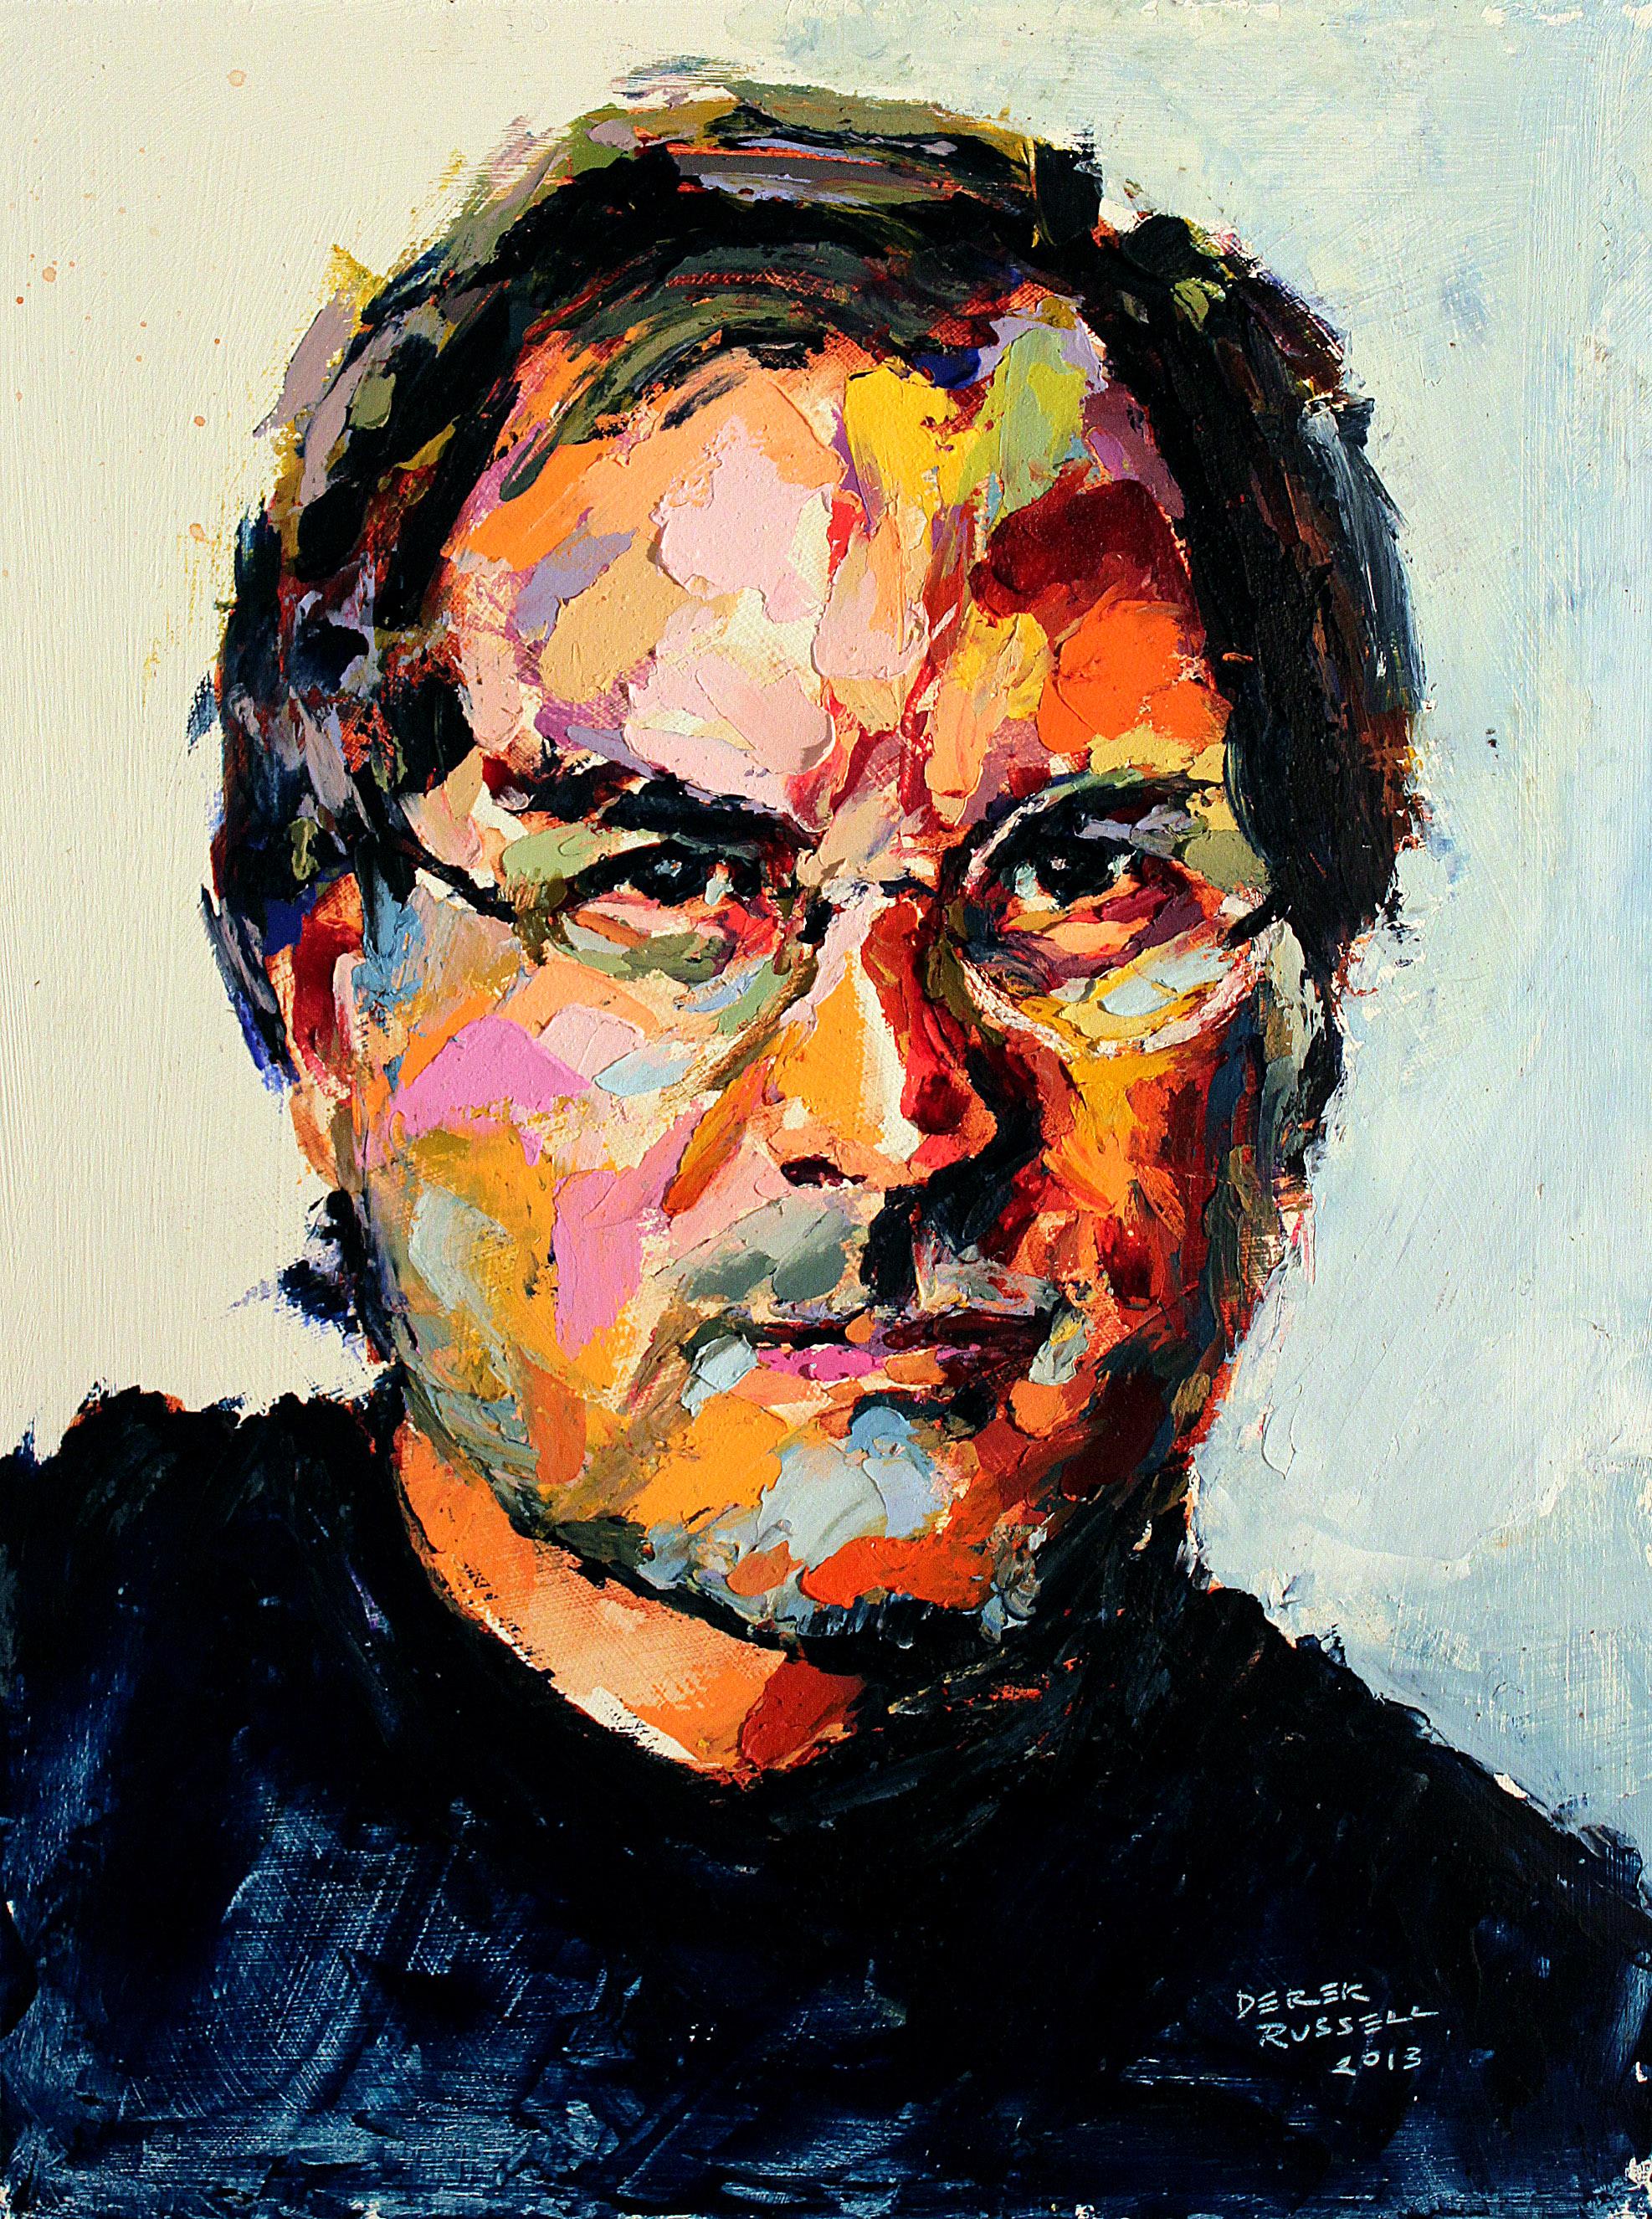 Steve Jobs Original Acrylic & Oil Portrait Painting by Artist Derek Russell 2013.jpg